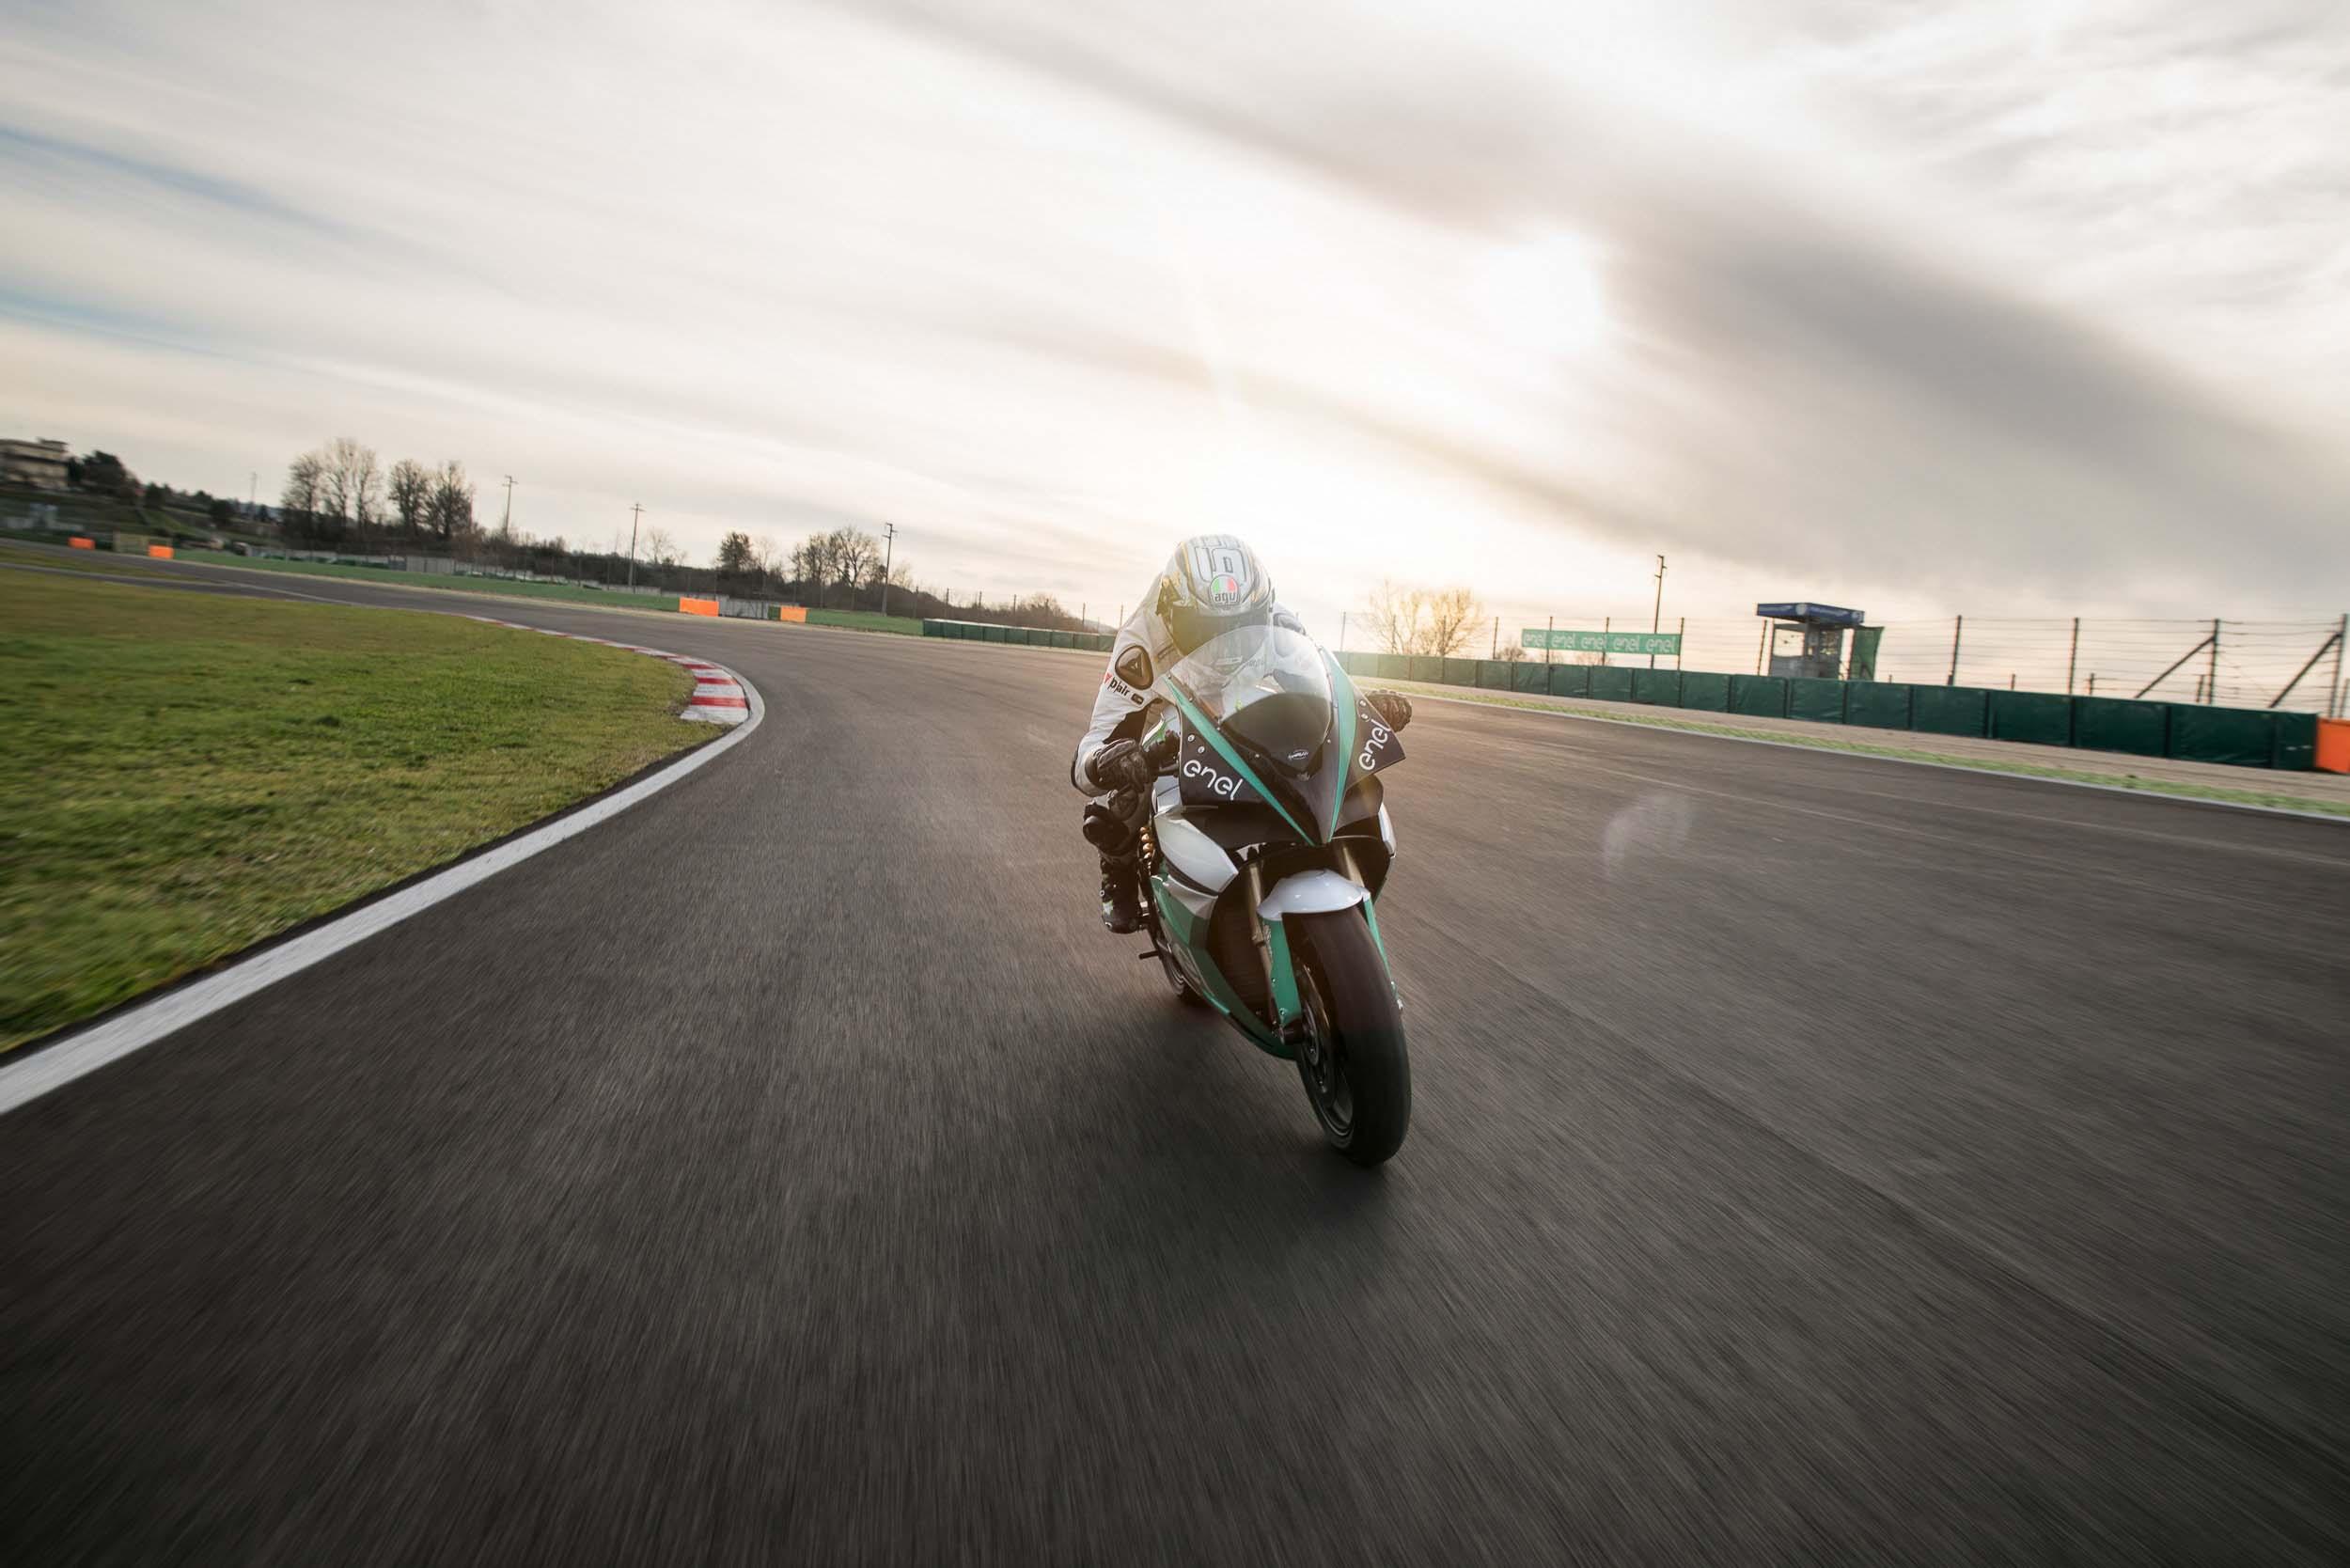 La sportive verte du futur - Page 16 FIM-Enel-MotoE-World-Cup-Energica-Ego-race-bike-01